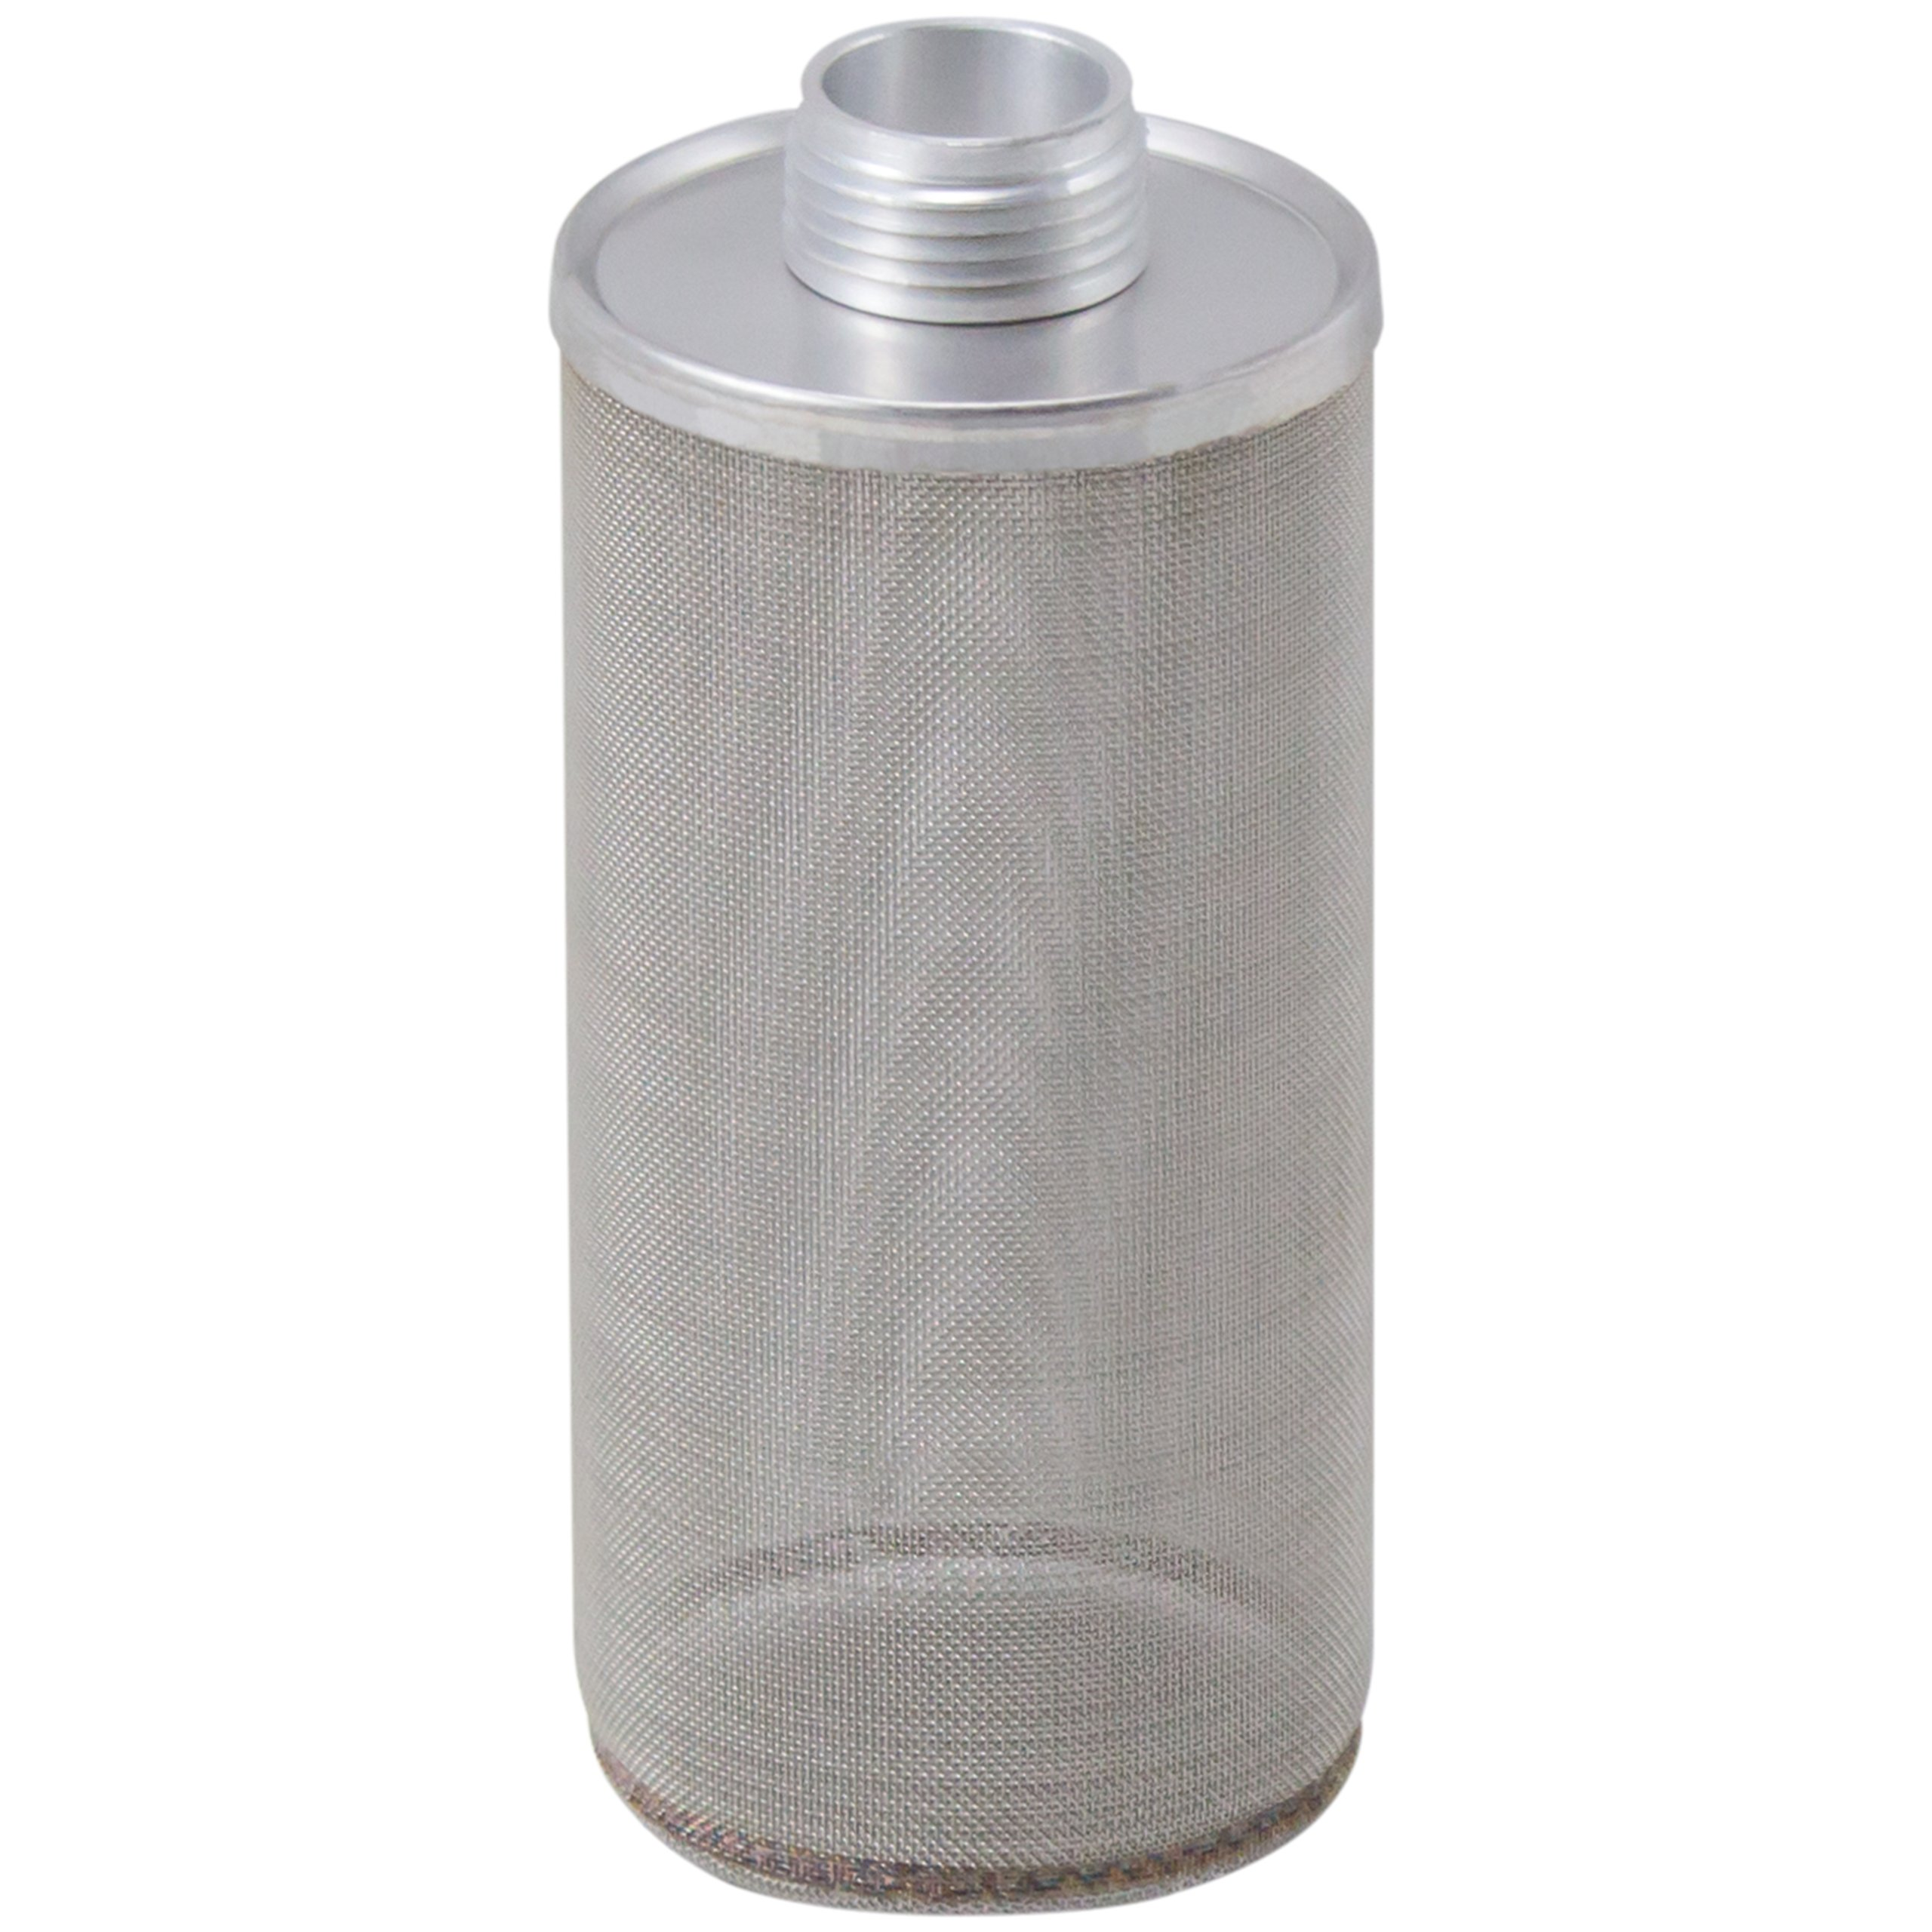 GOLDENROD (470-15) 40-Mesh Fuel Tank Filter Strainer